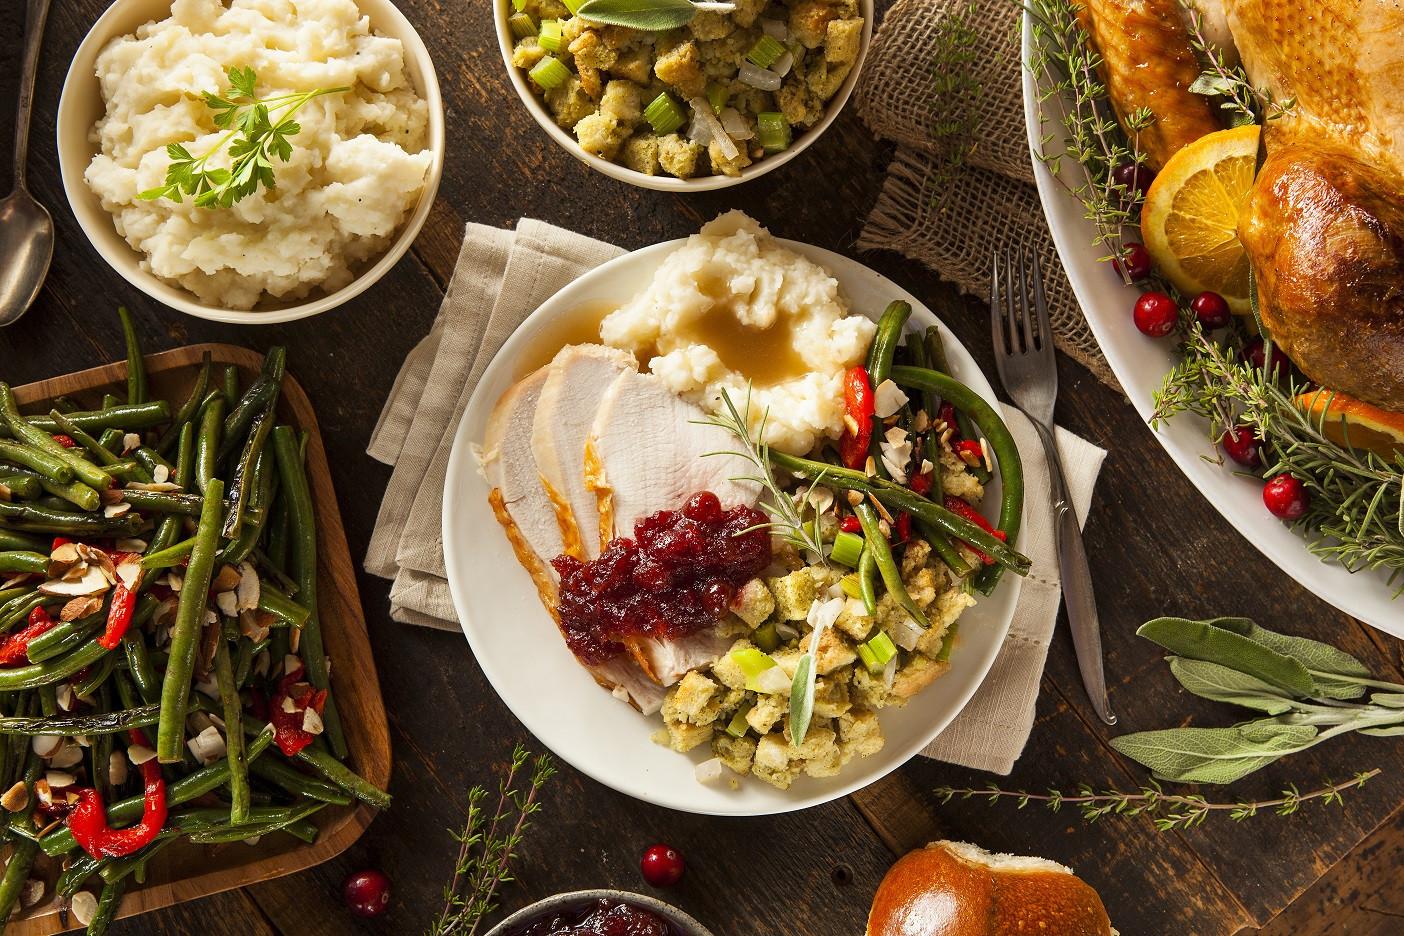 Idea For Thanksgiving Dinner  Thanksgiving Dinner Traditions in Ocean City MD